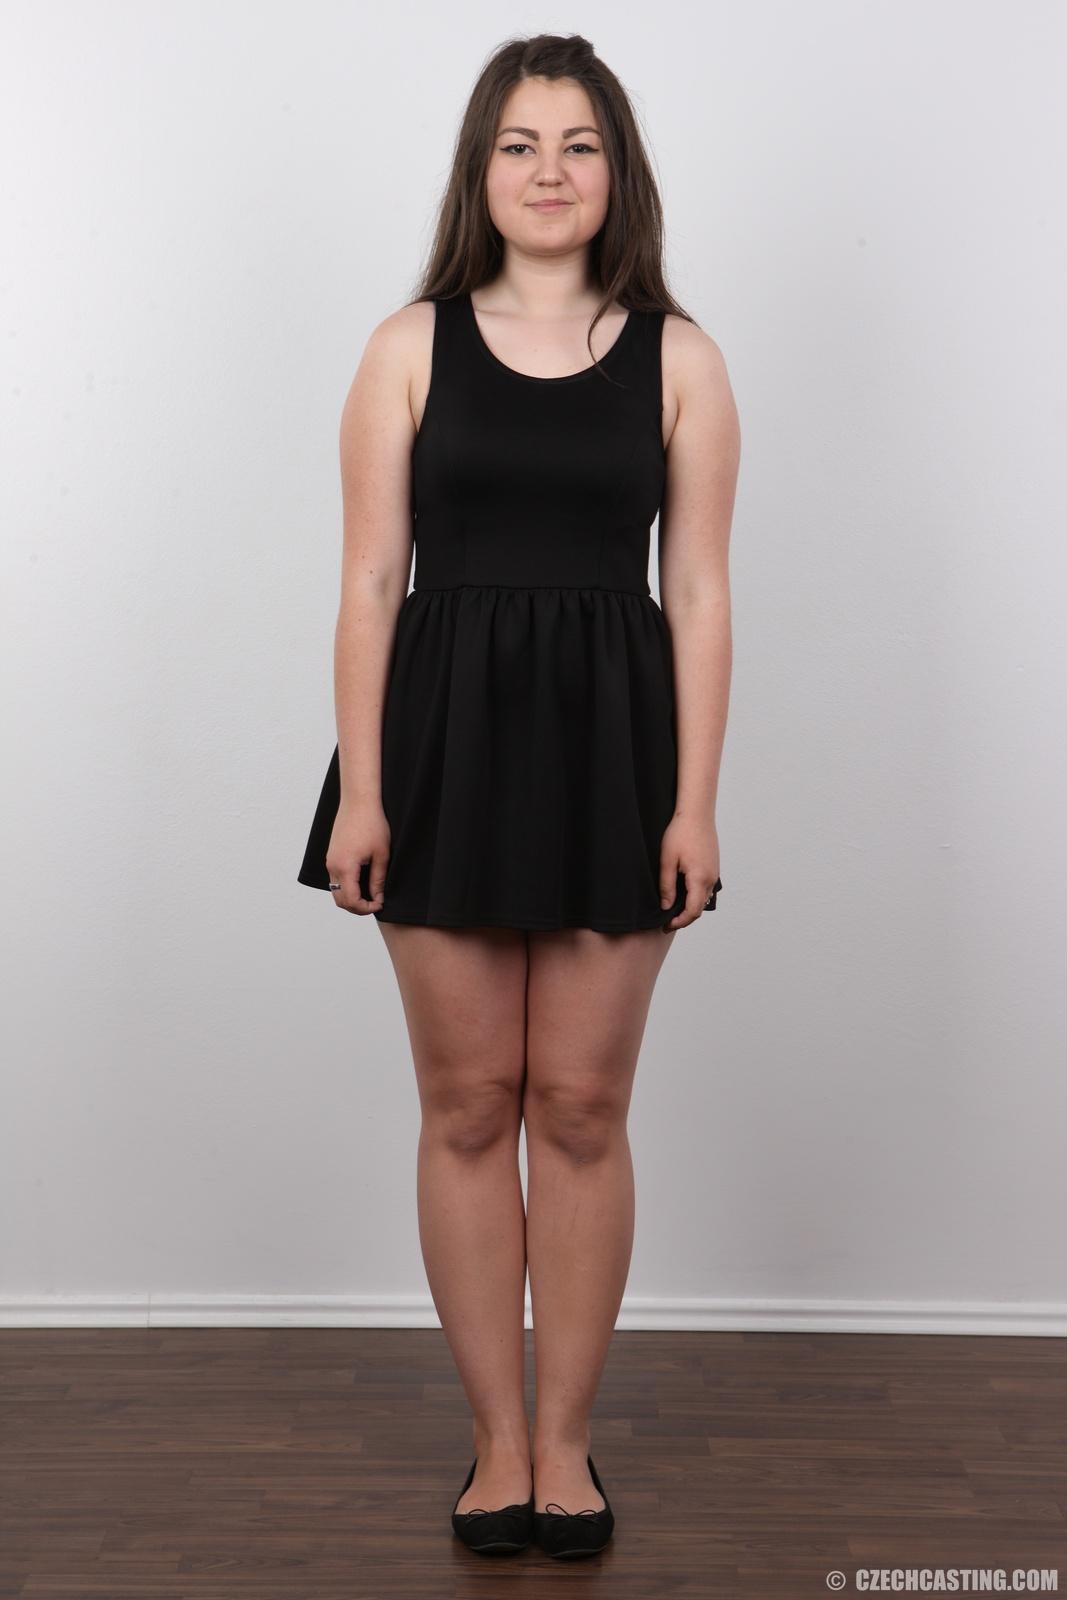 2 chech girls do their legs apart - 2 9